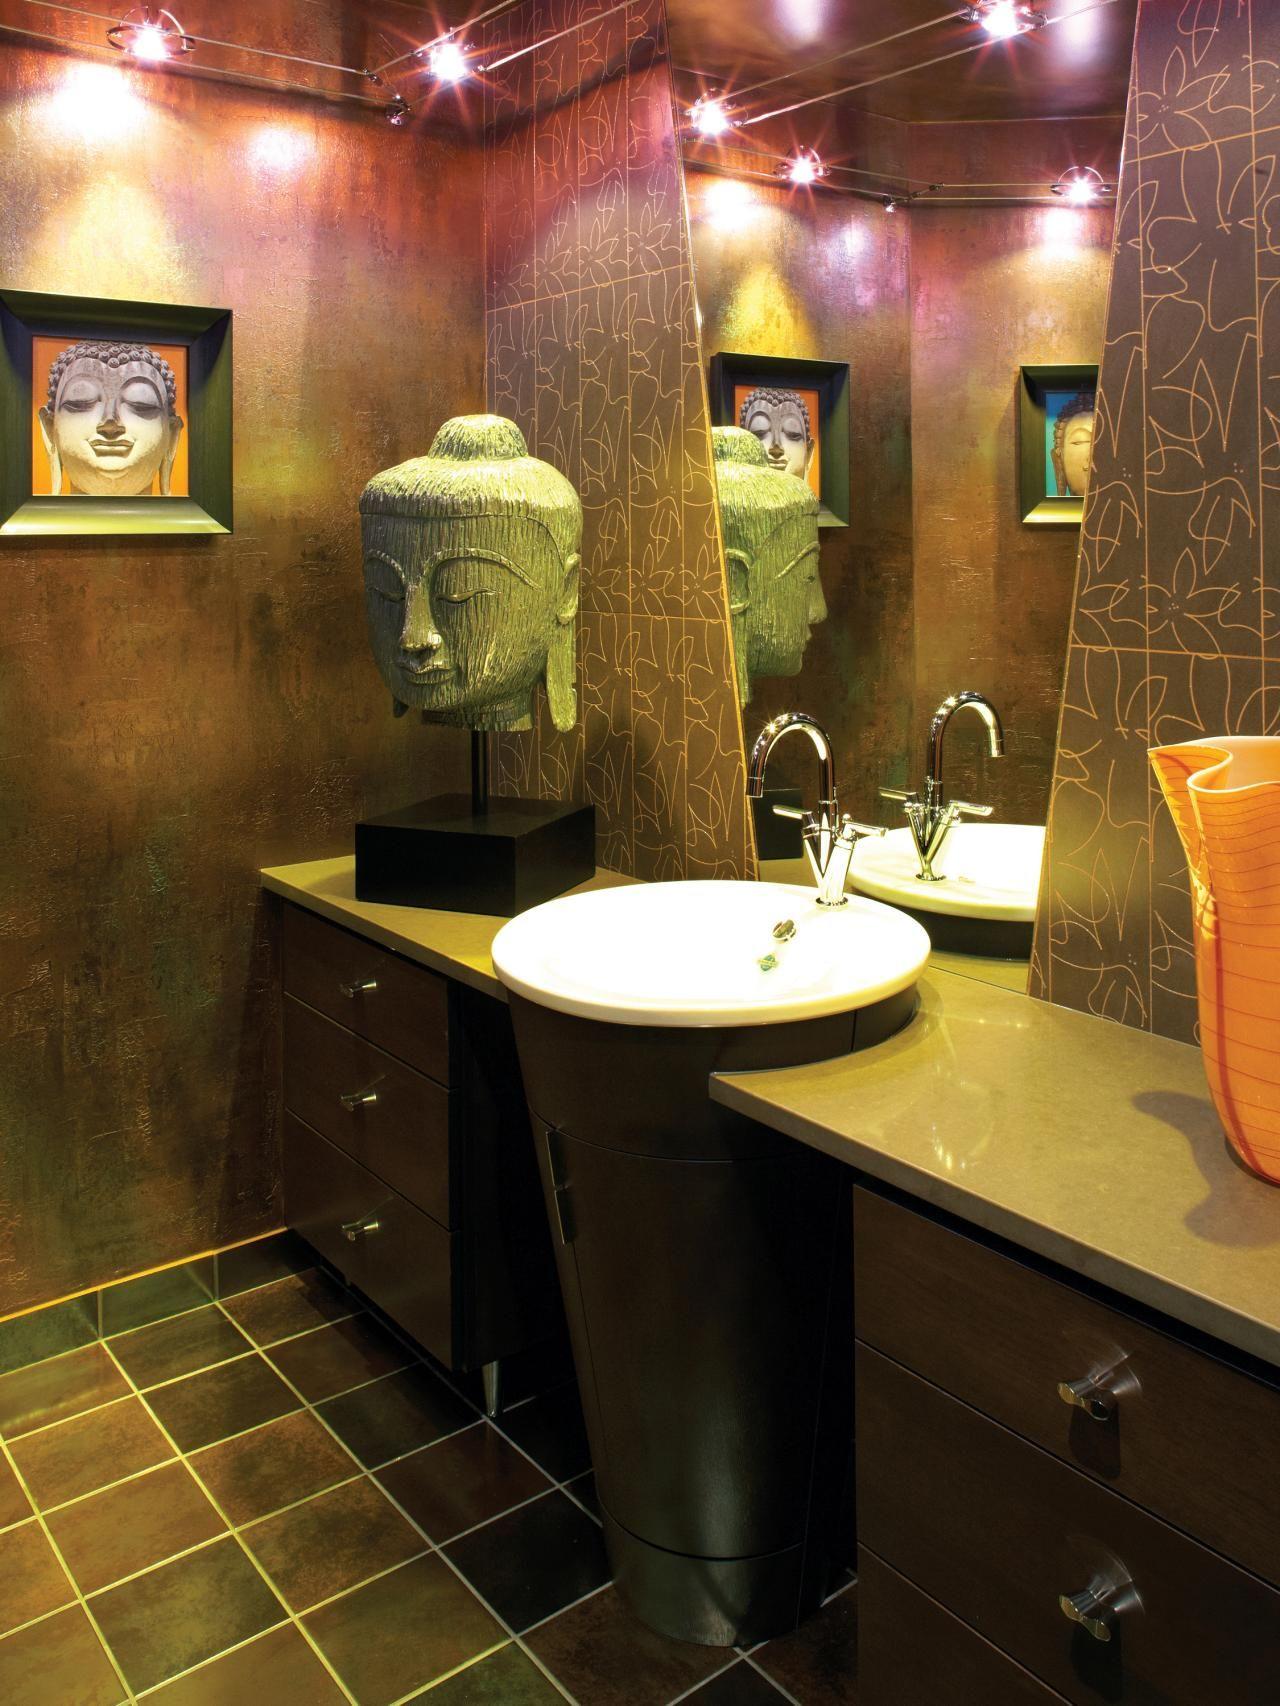 Bathroom Designs From Nkba 2012 Finalists  Bathroom Designs Bath Endearing Bathroom Designs 2012 Inspiration